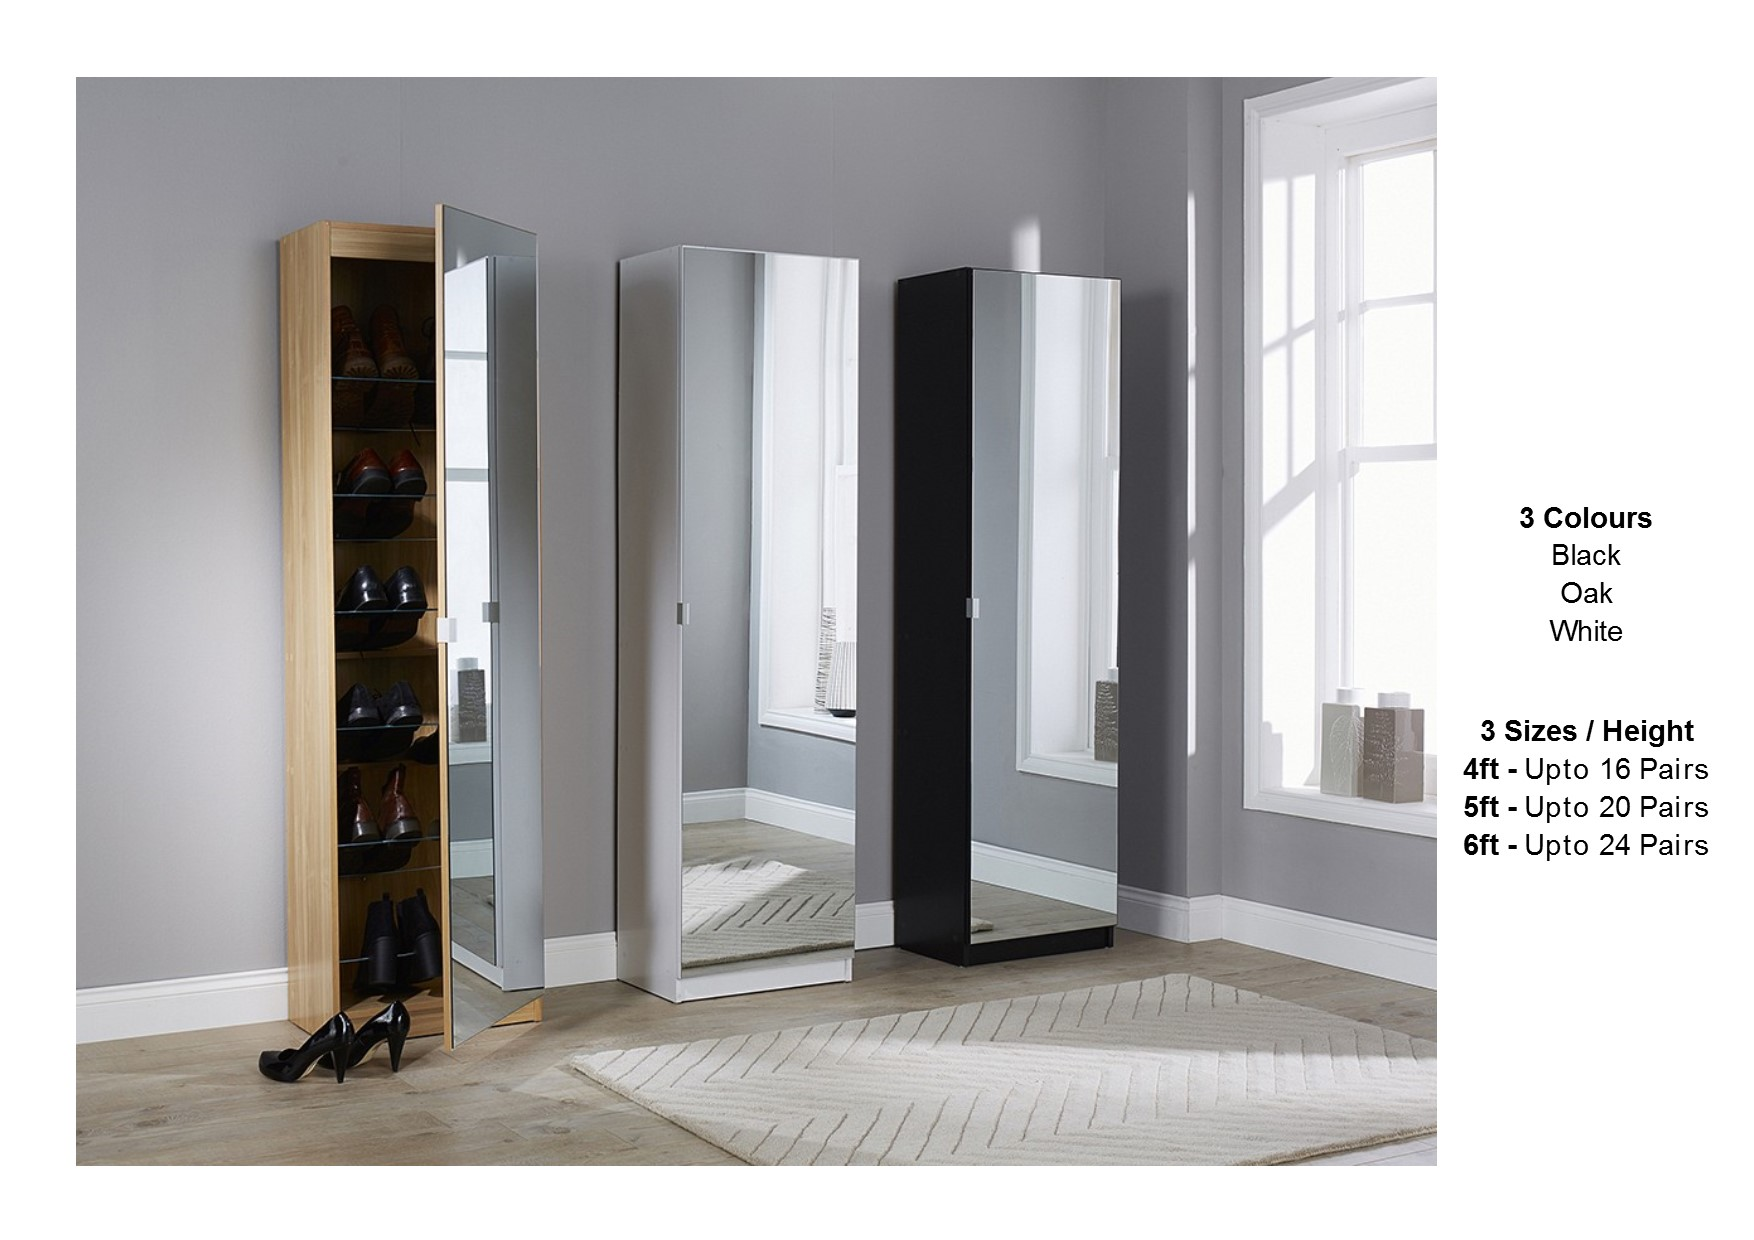 Mirrored Shoe Cabinet Storage Rack Full Mirror 3 Sizes